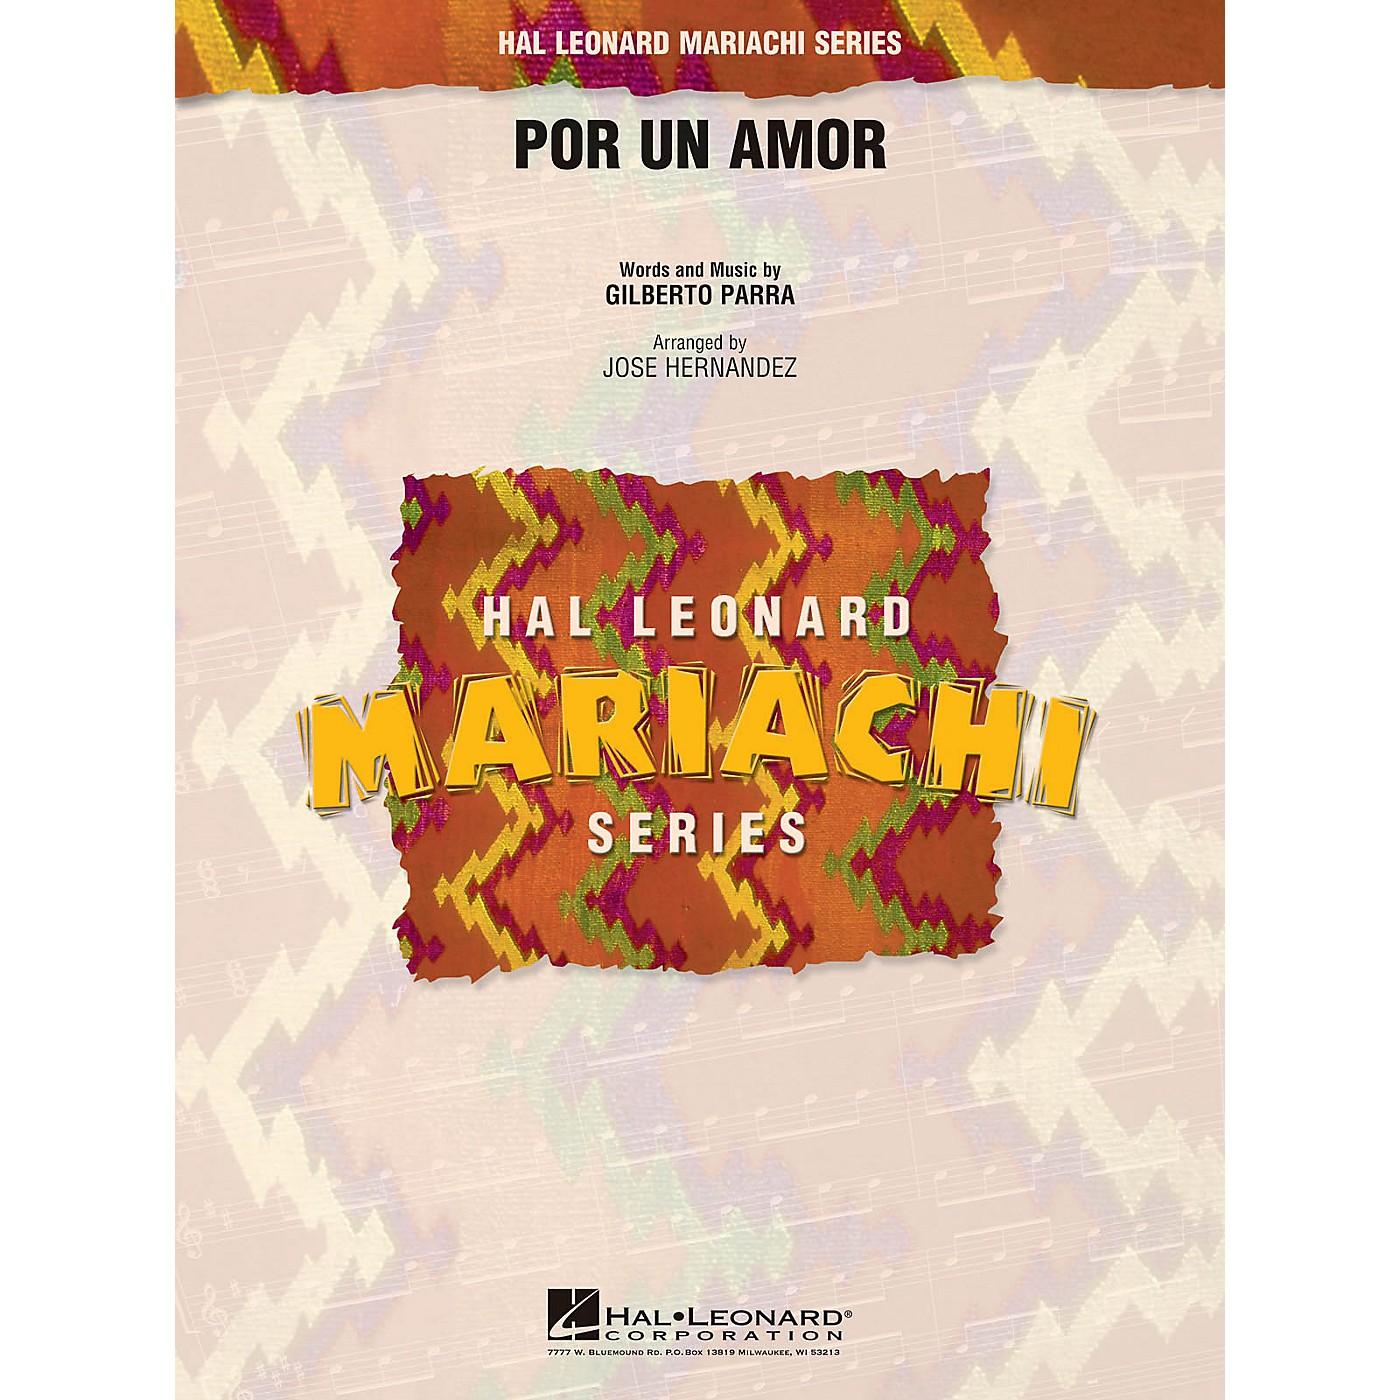 Hal Leonard Por Un Amor Concert Band Level 2.5 Arranged by Jose Hernandez thumbnail